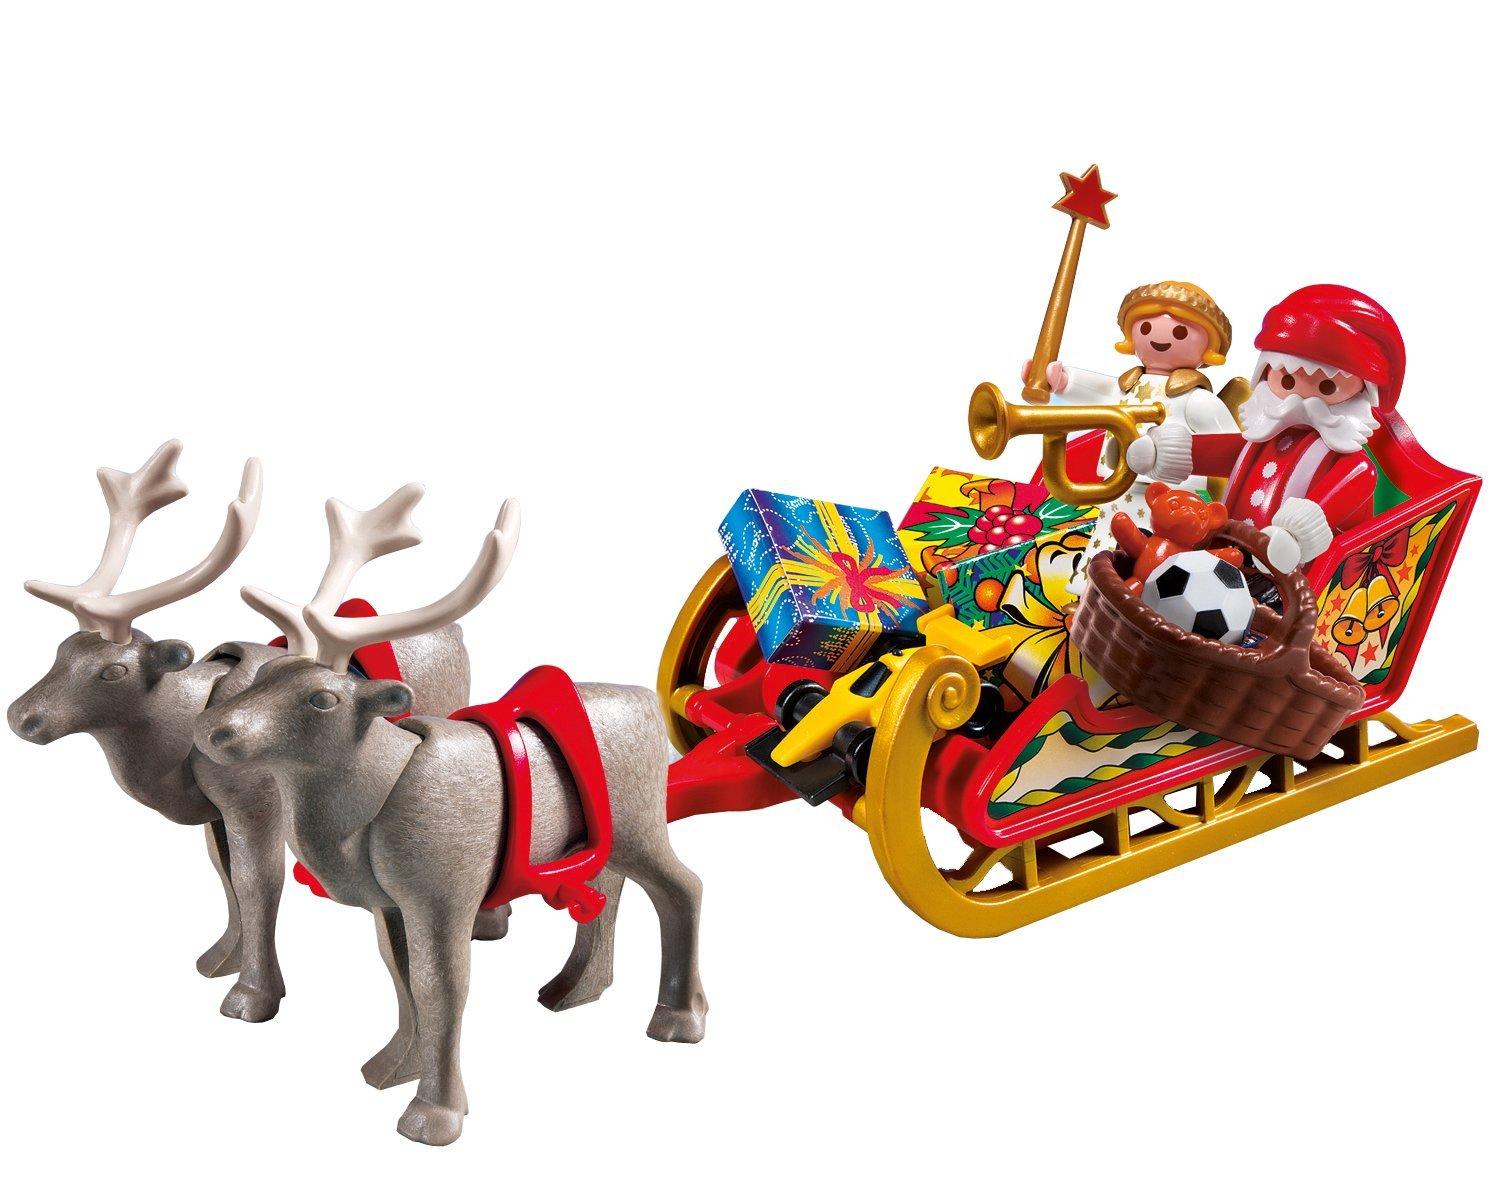 1492x1193 Playmobil Santa's Sleigh Toys Amp Games